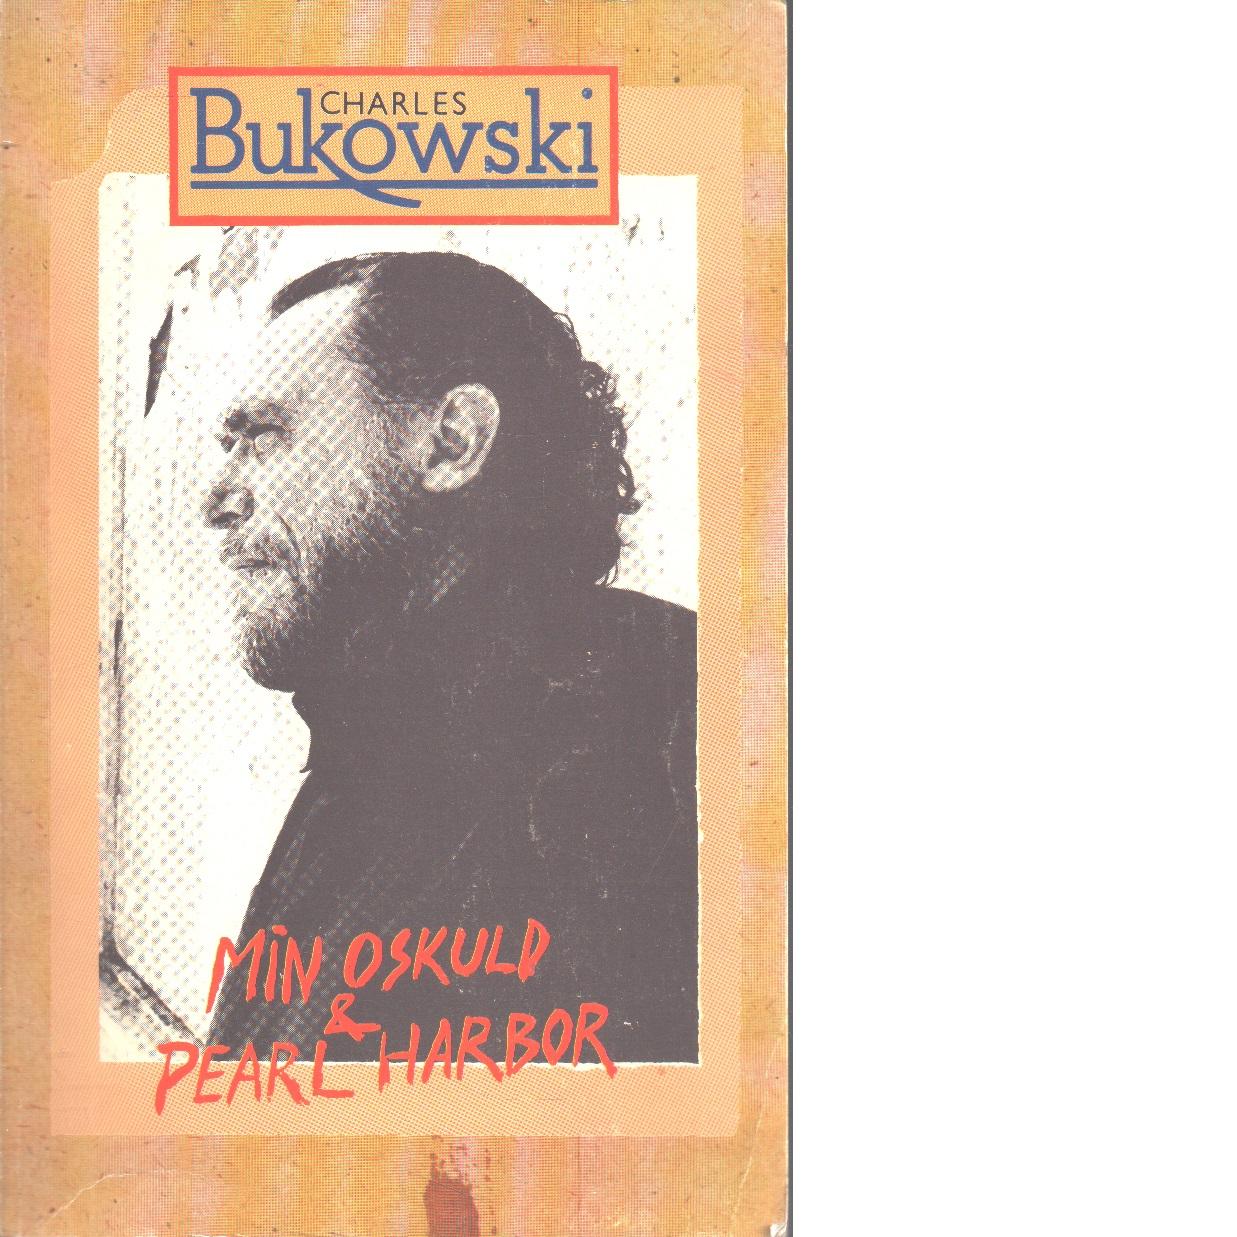 Min oskuld & Pearl Harbor - Bukowski, Charles